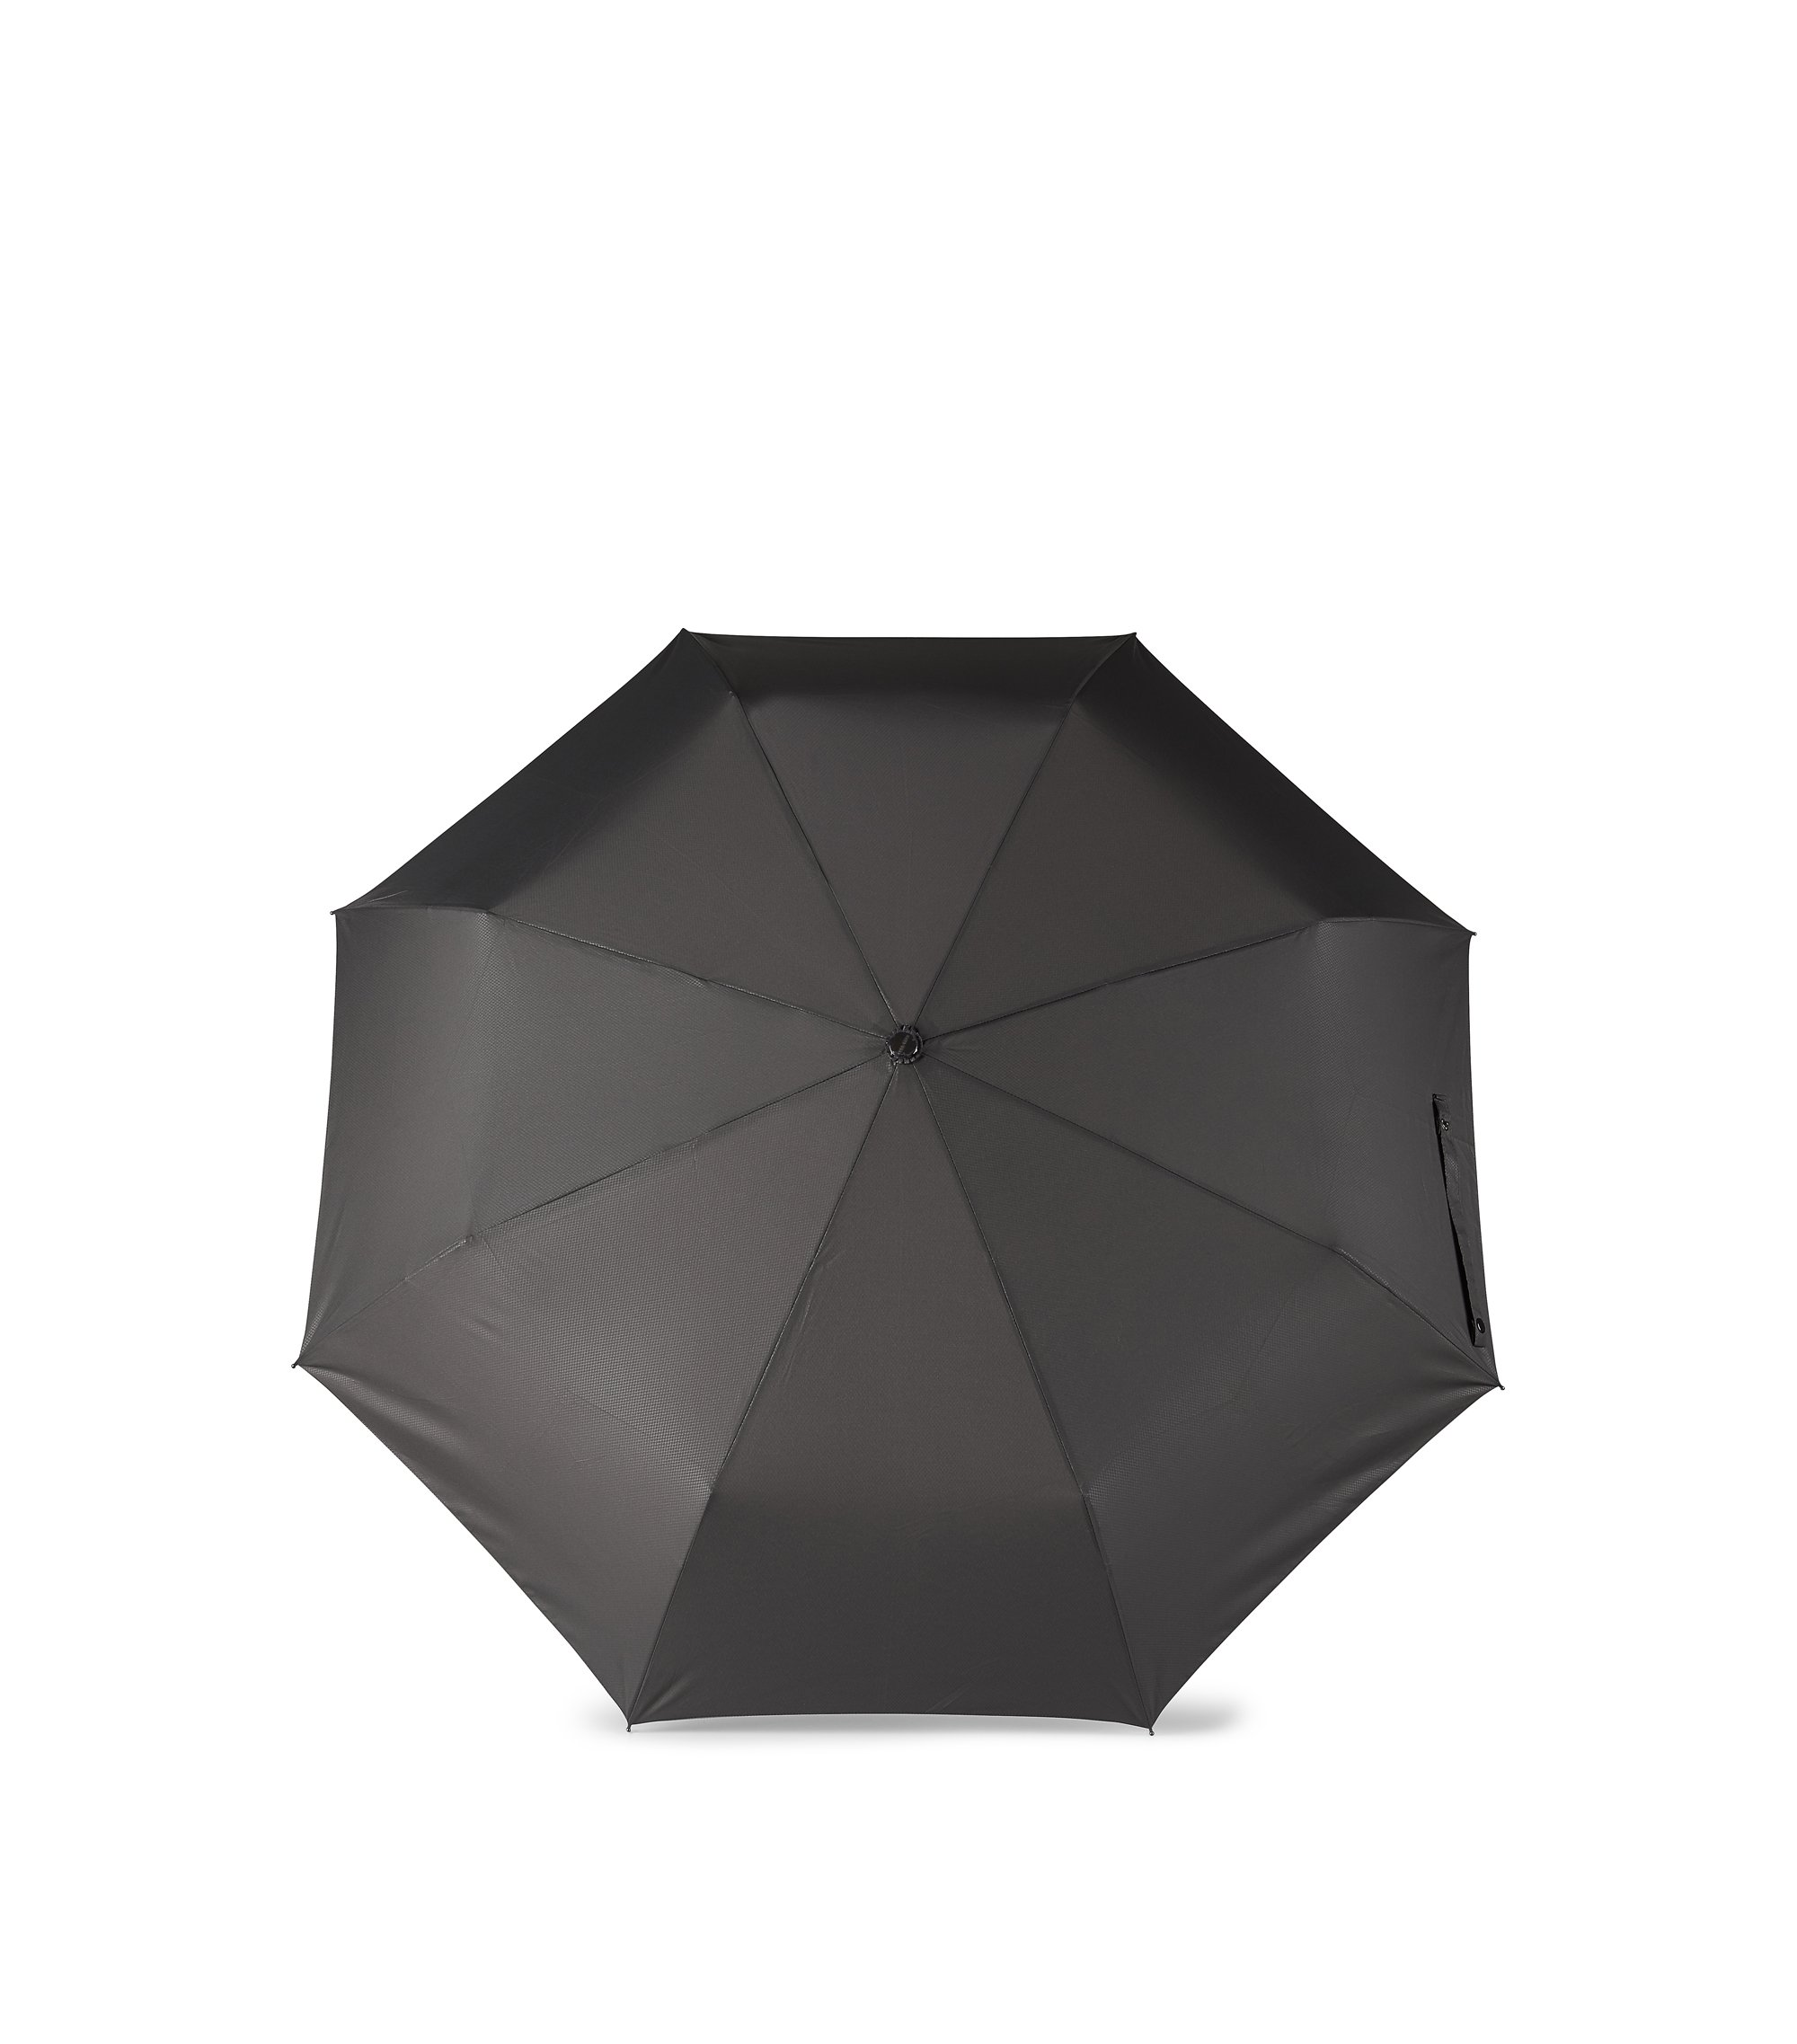 Aluminum Frame Patterned Pocket Umbrella | Umbrella New Loop Dark, Grey